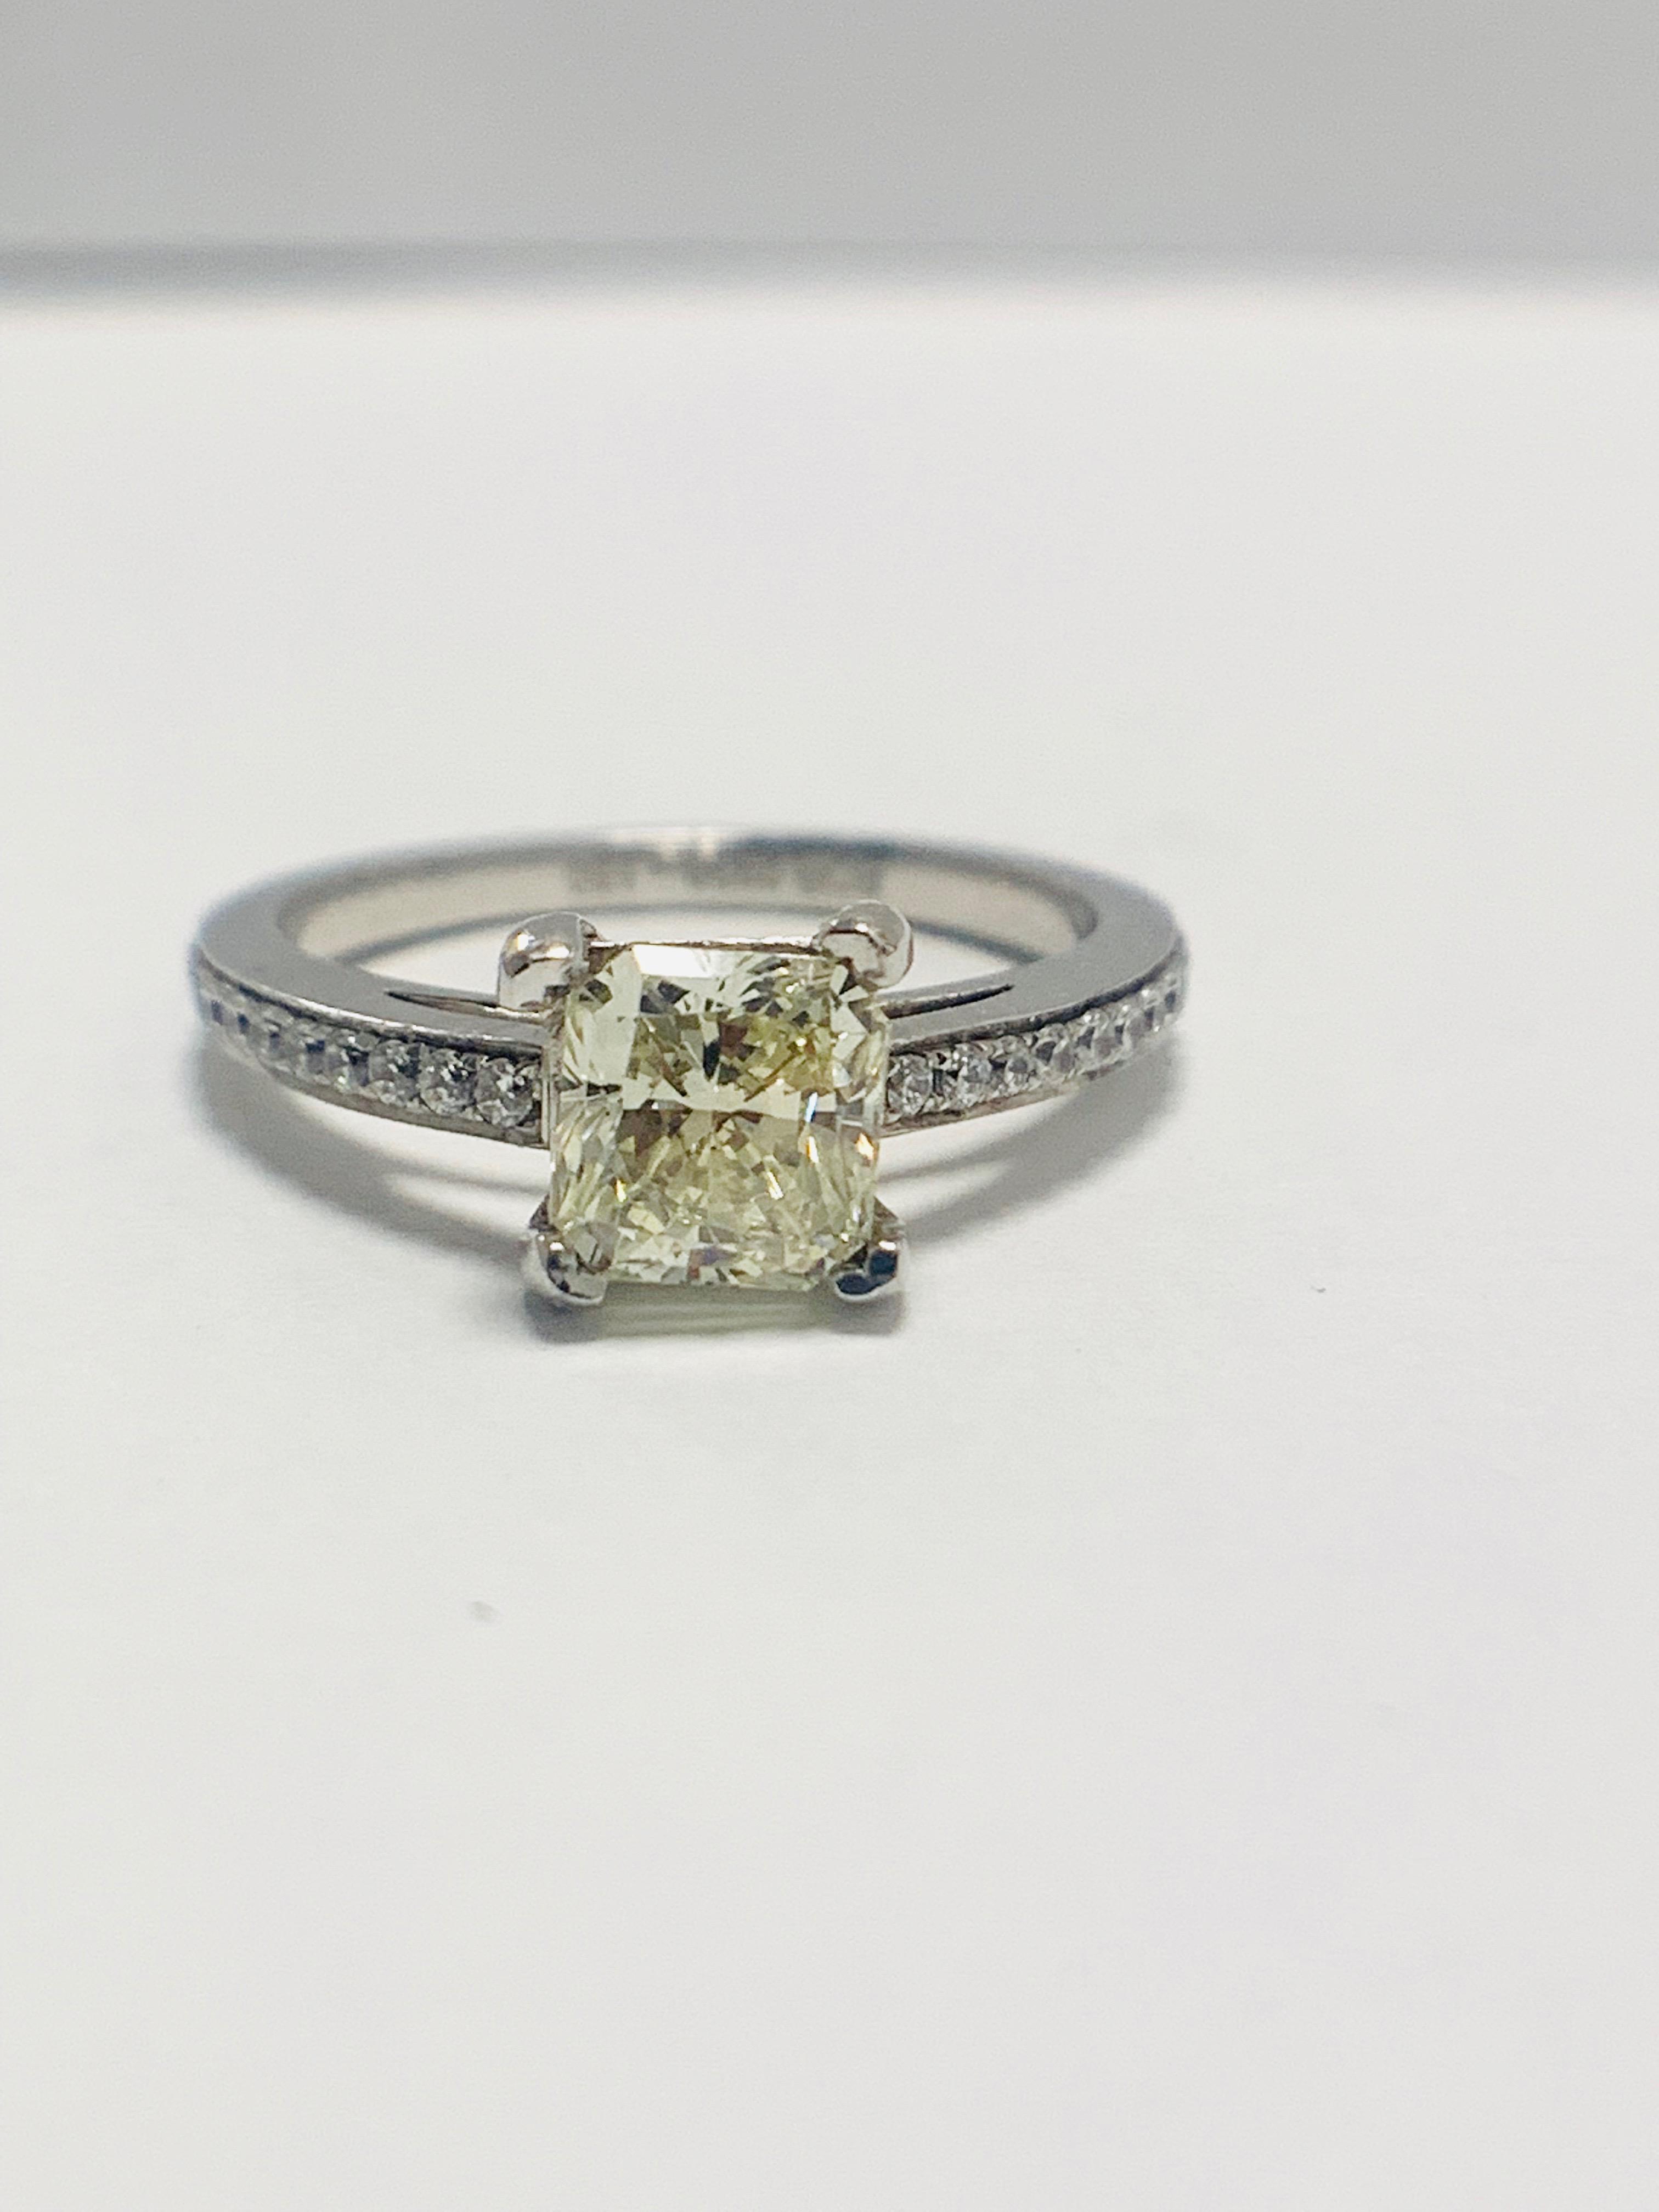 1ct cushion cut platinum diamond solitaire ring